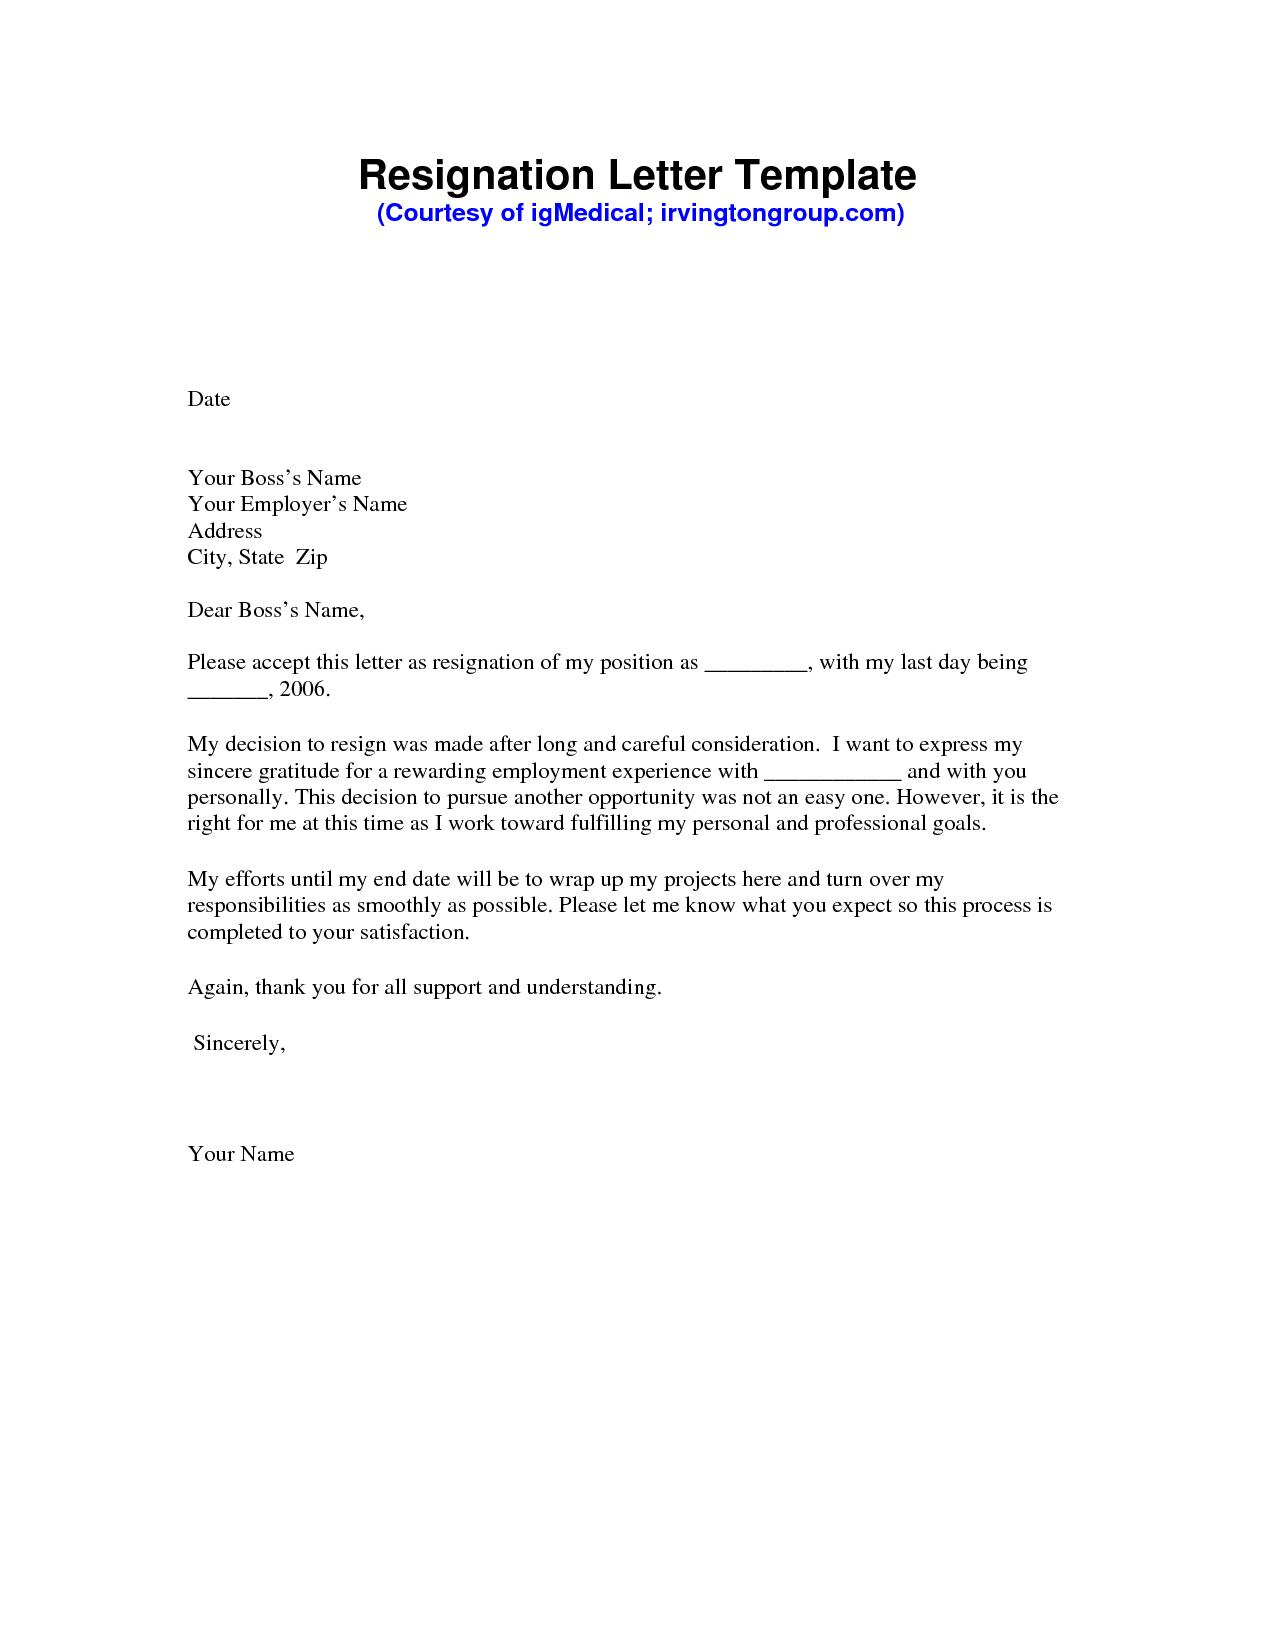 letter of resignation template pdf example-Resignation Letter Sample PDF 8-b